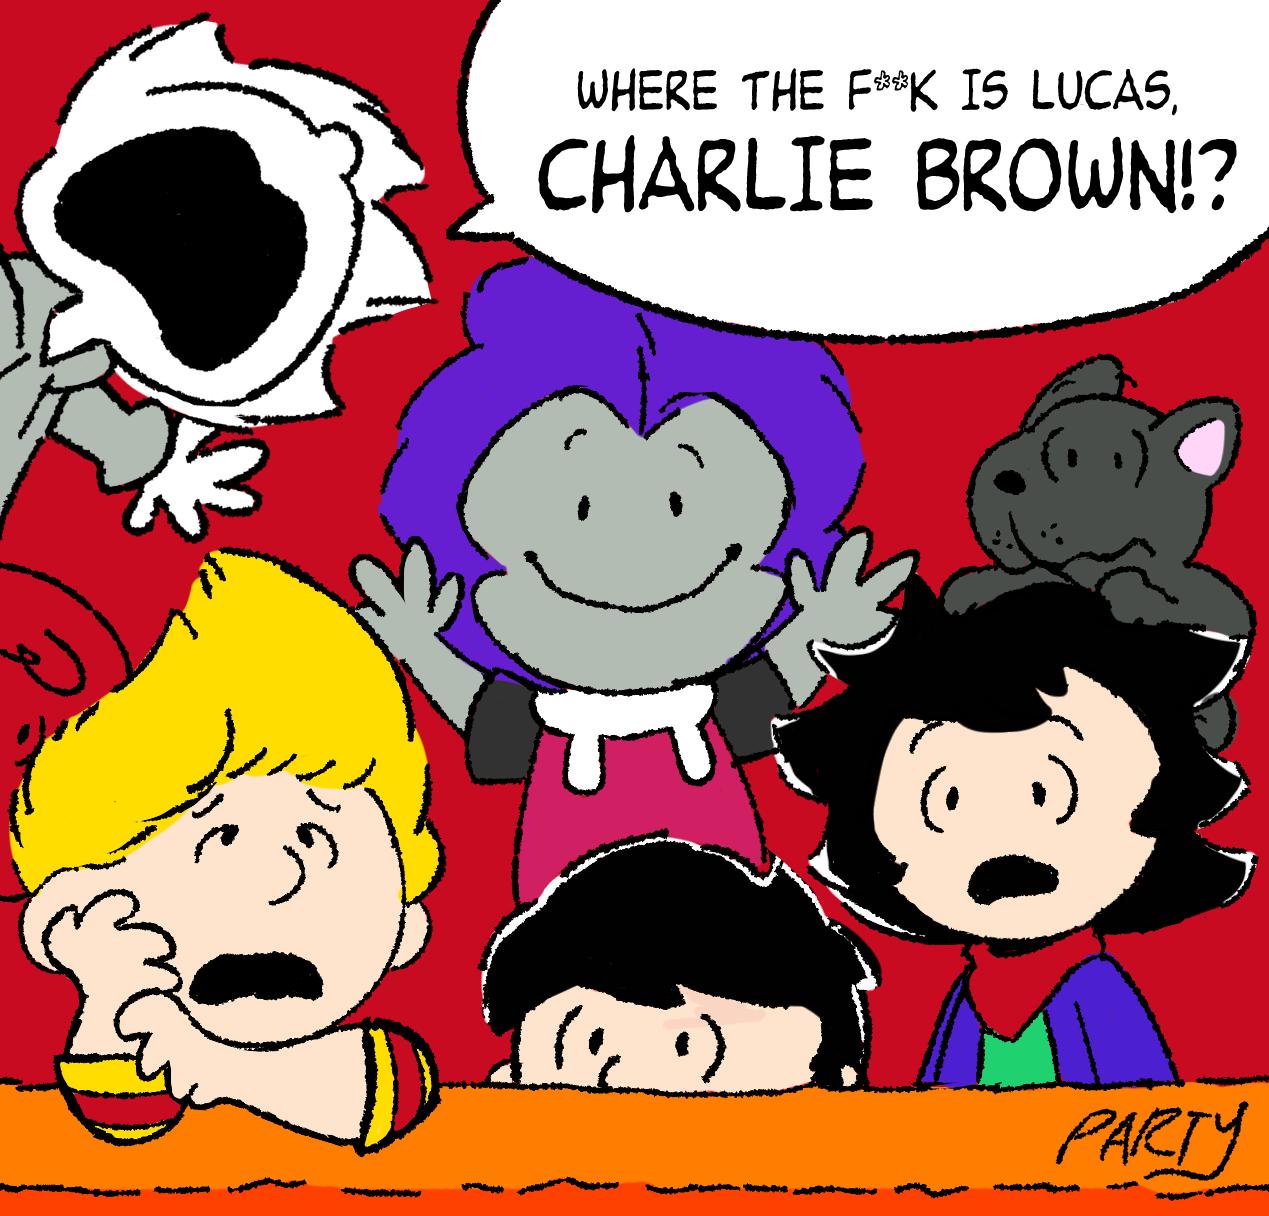 Lucas Peanuts